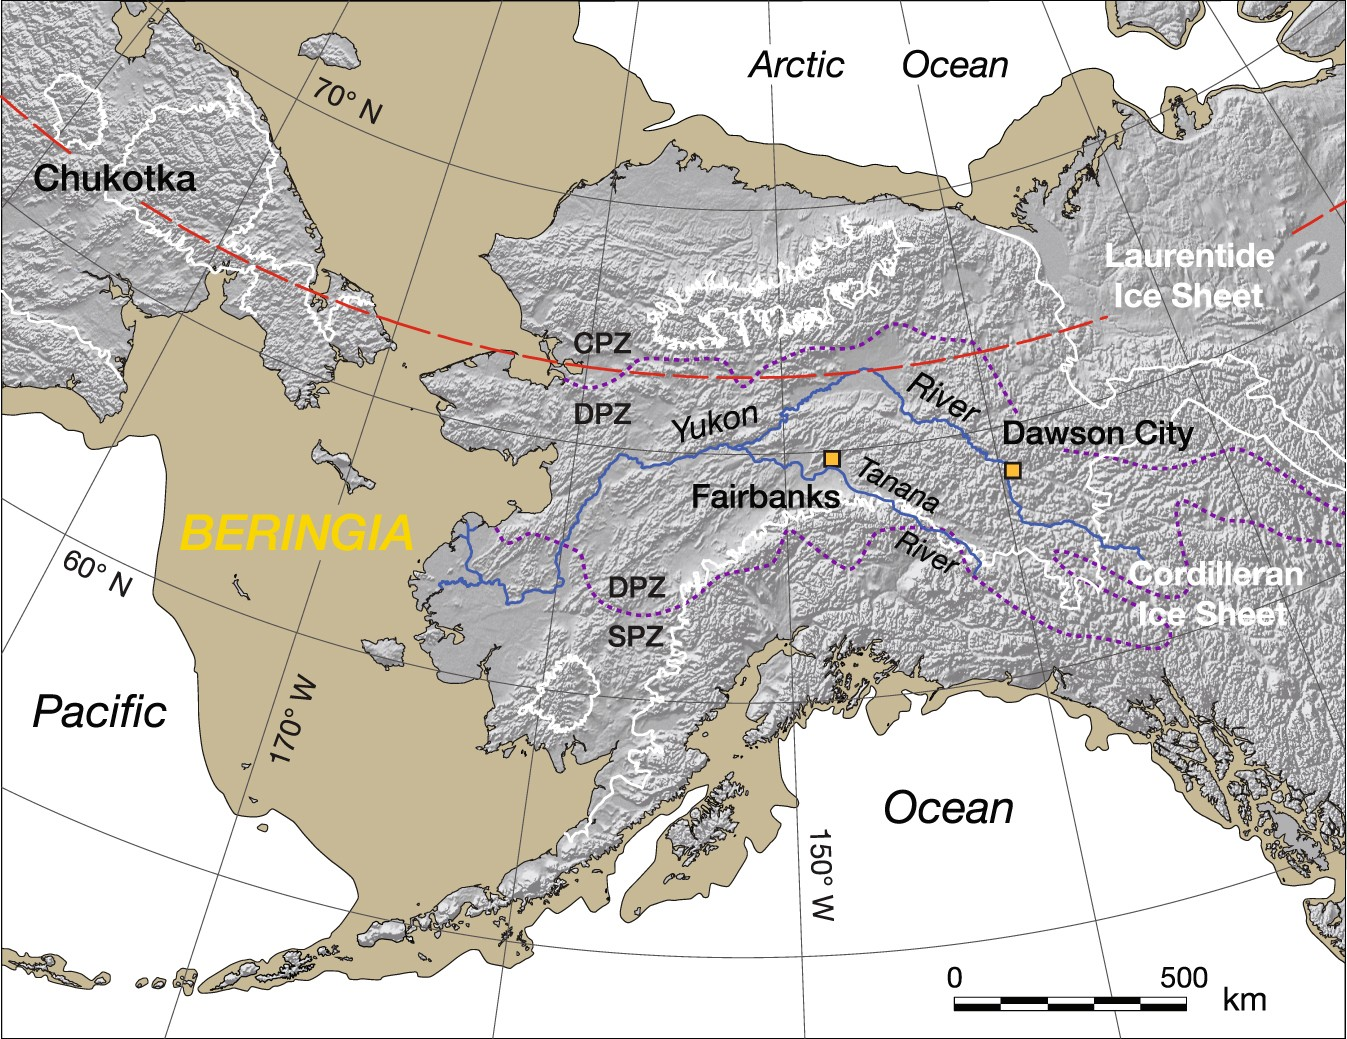 Impact-related microspherules in Late Pleistocene Alaskan and Yukon ...